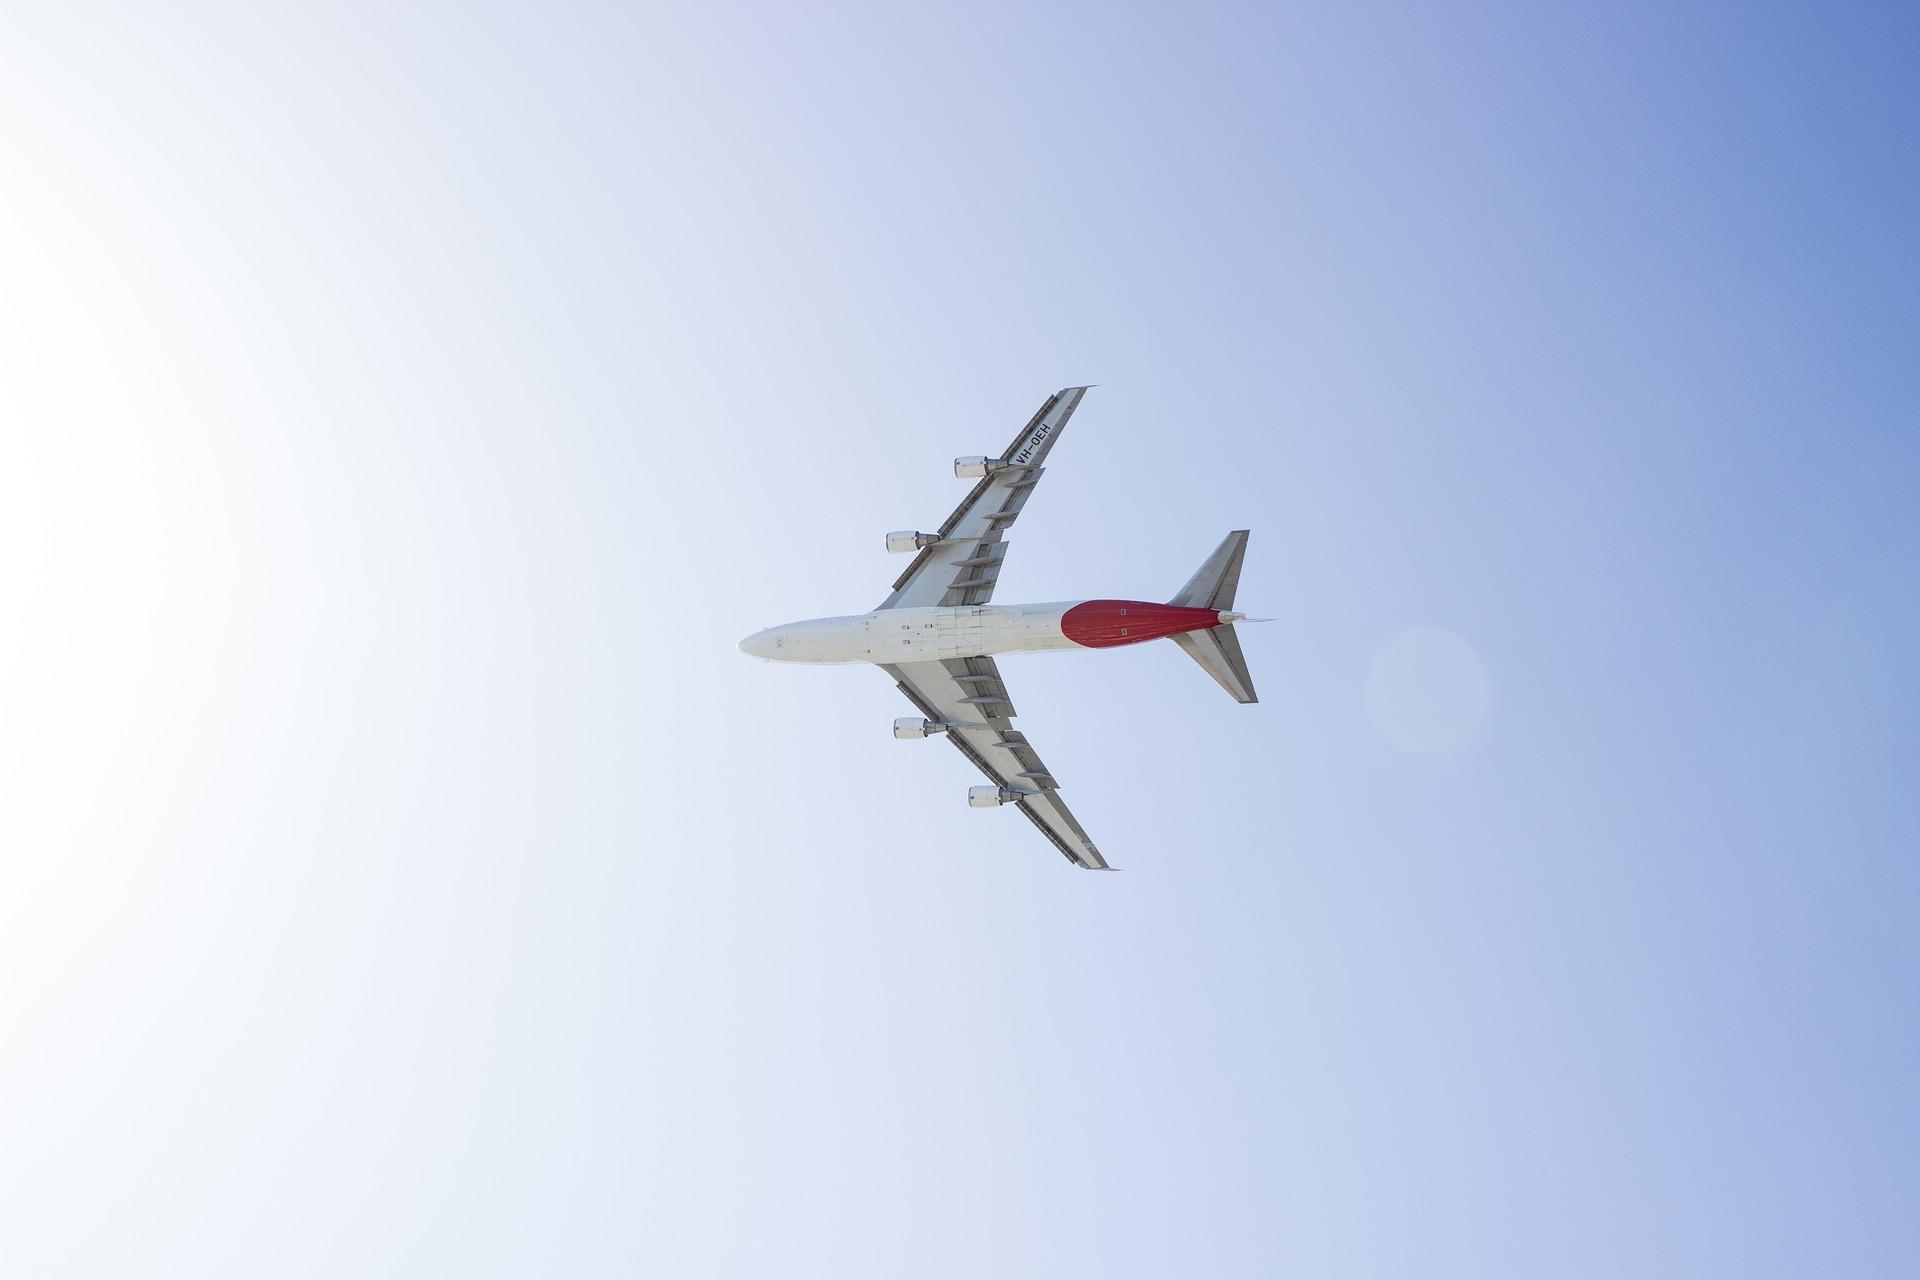 aeroplane-1867548_1920.jpg